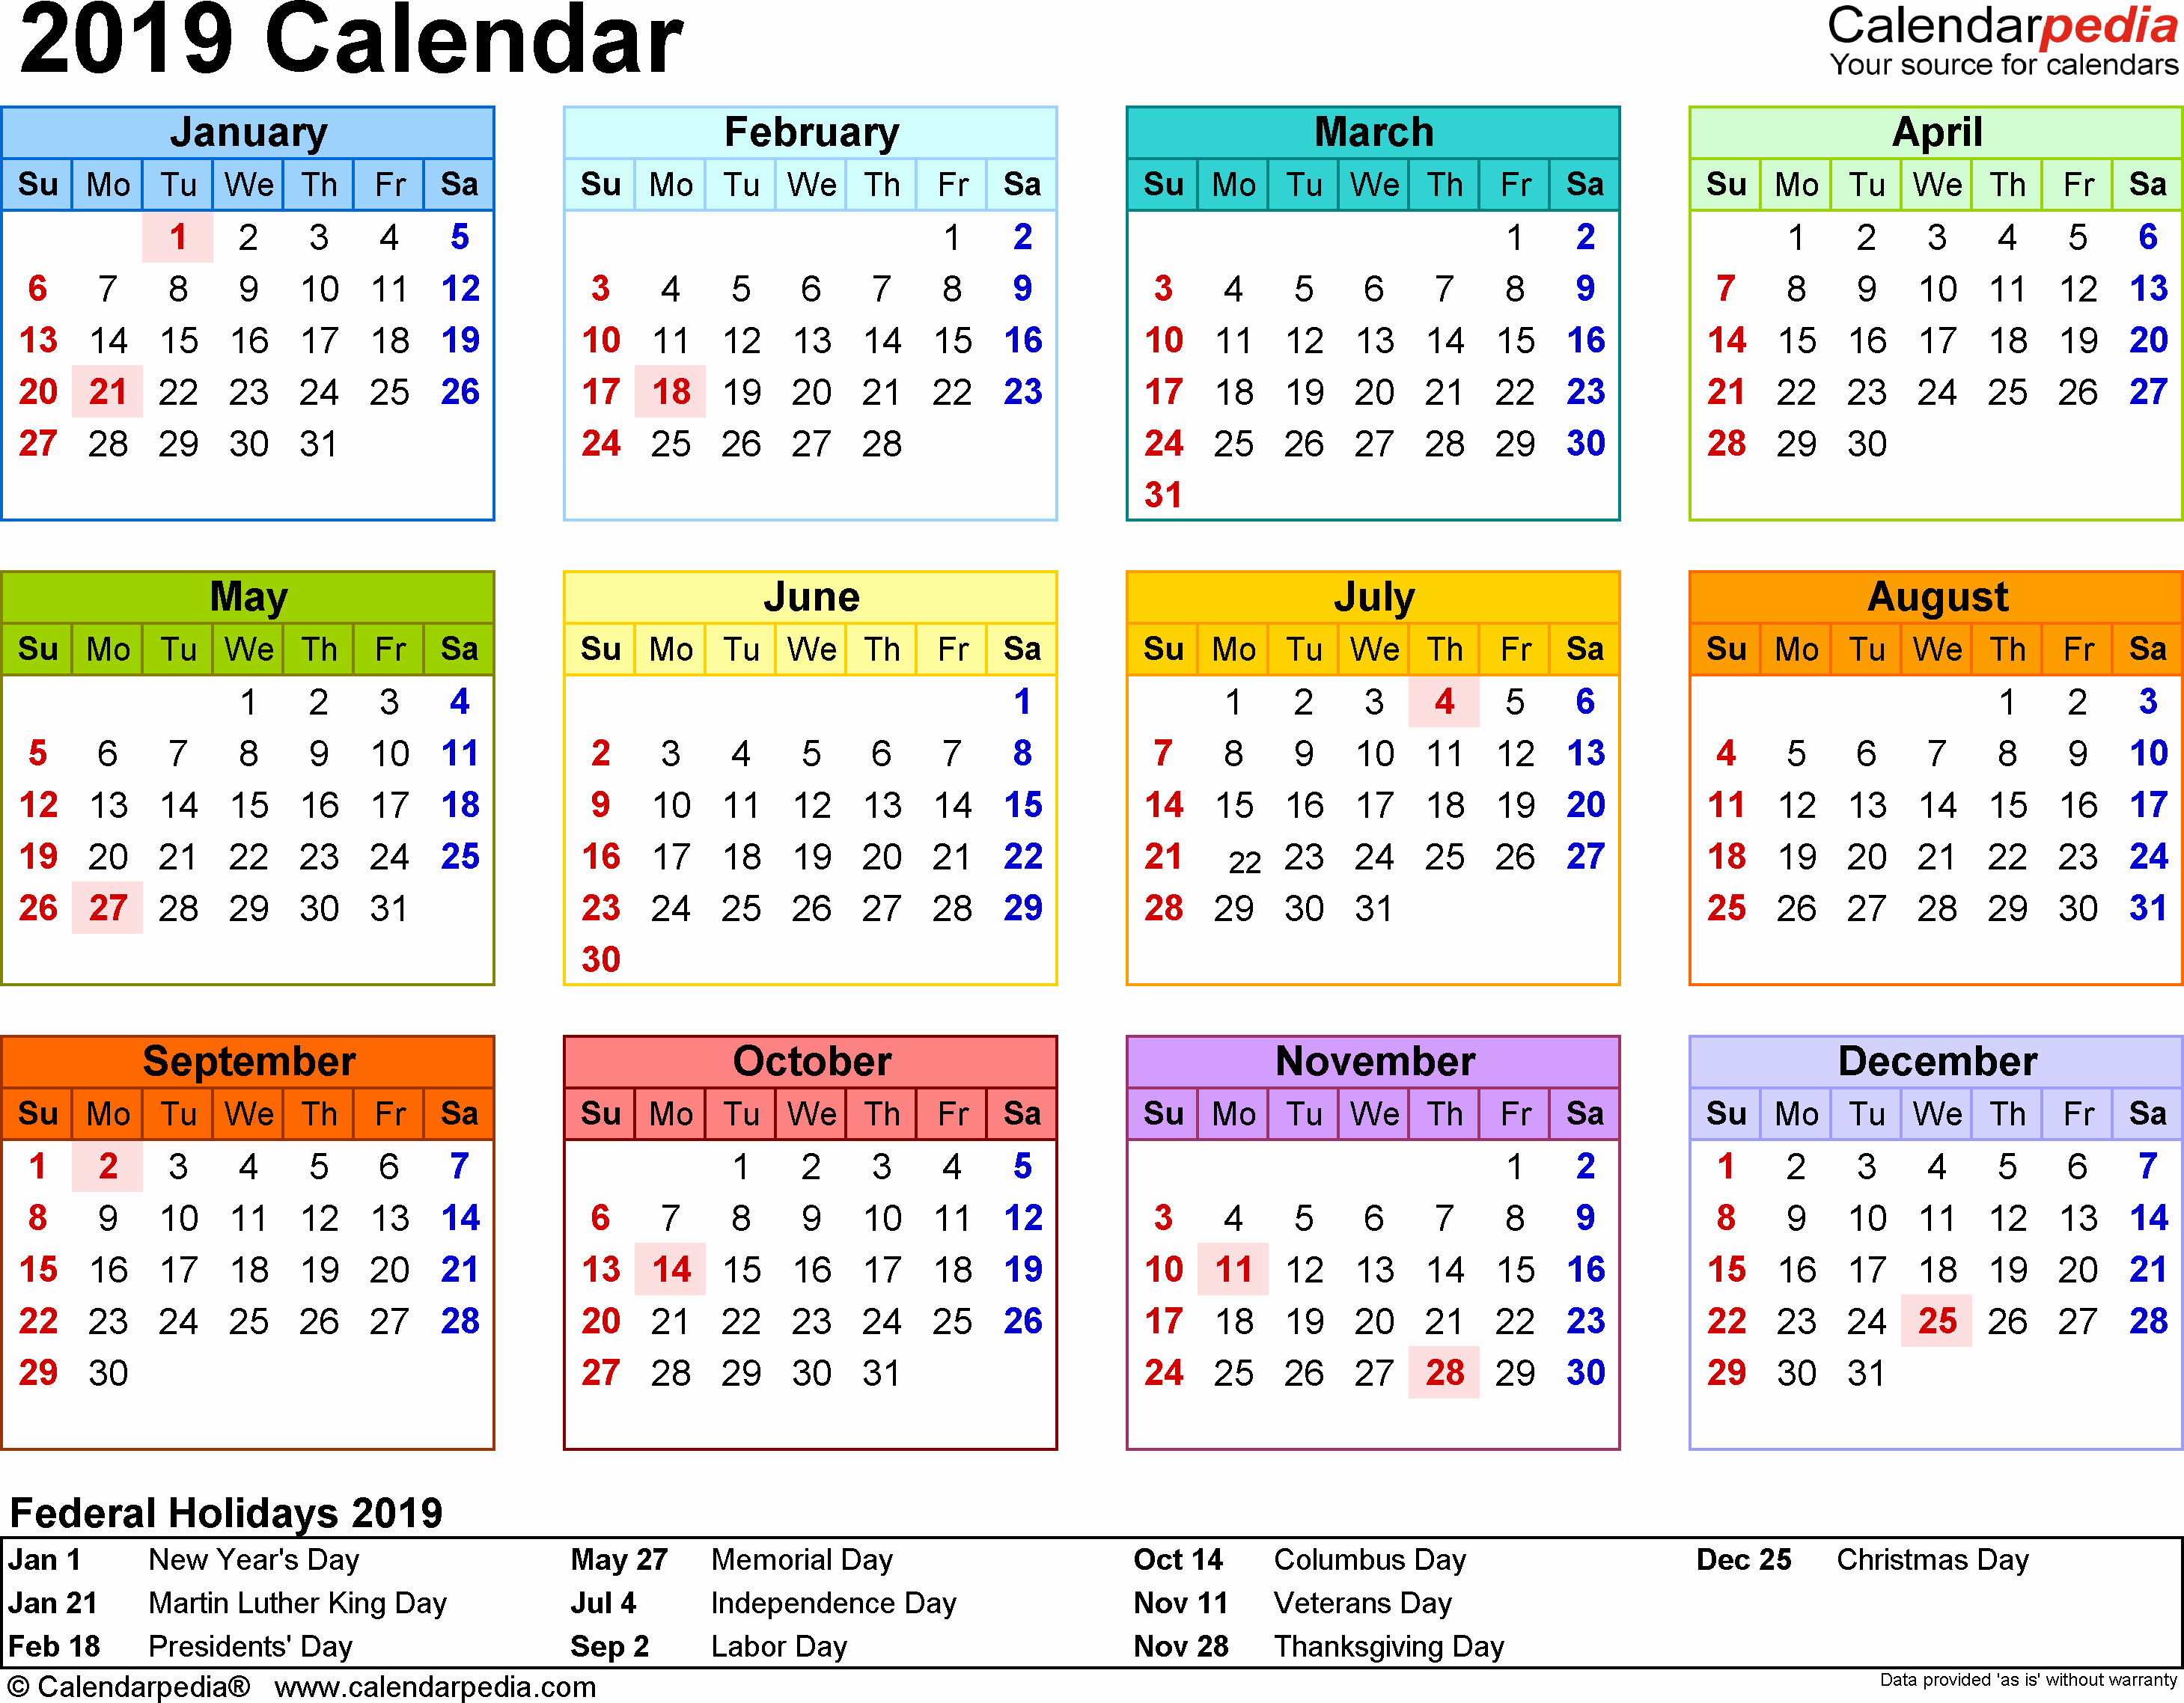 Microsoft Calendar Templates 2019 Inspirational 2019 Calendar 18 Free Printable Word Calendar Templates